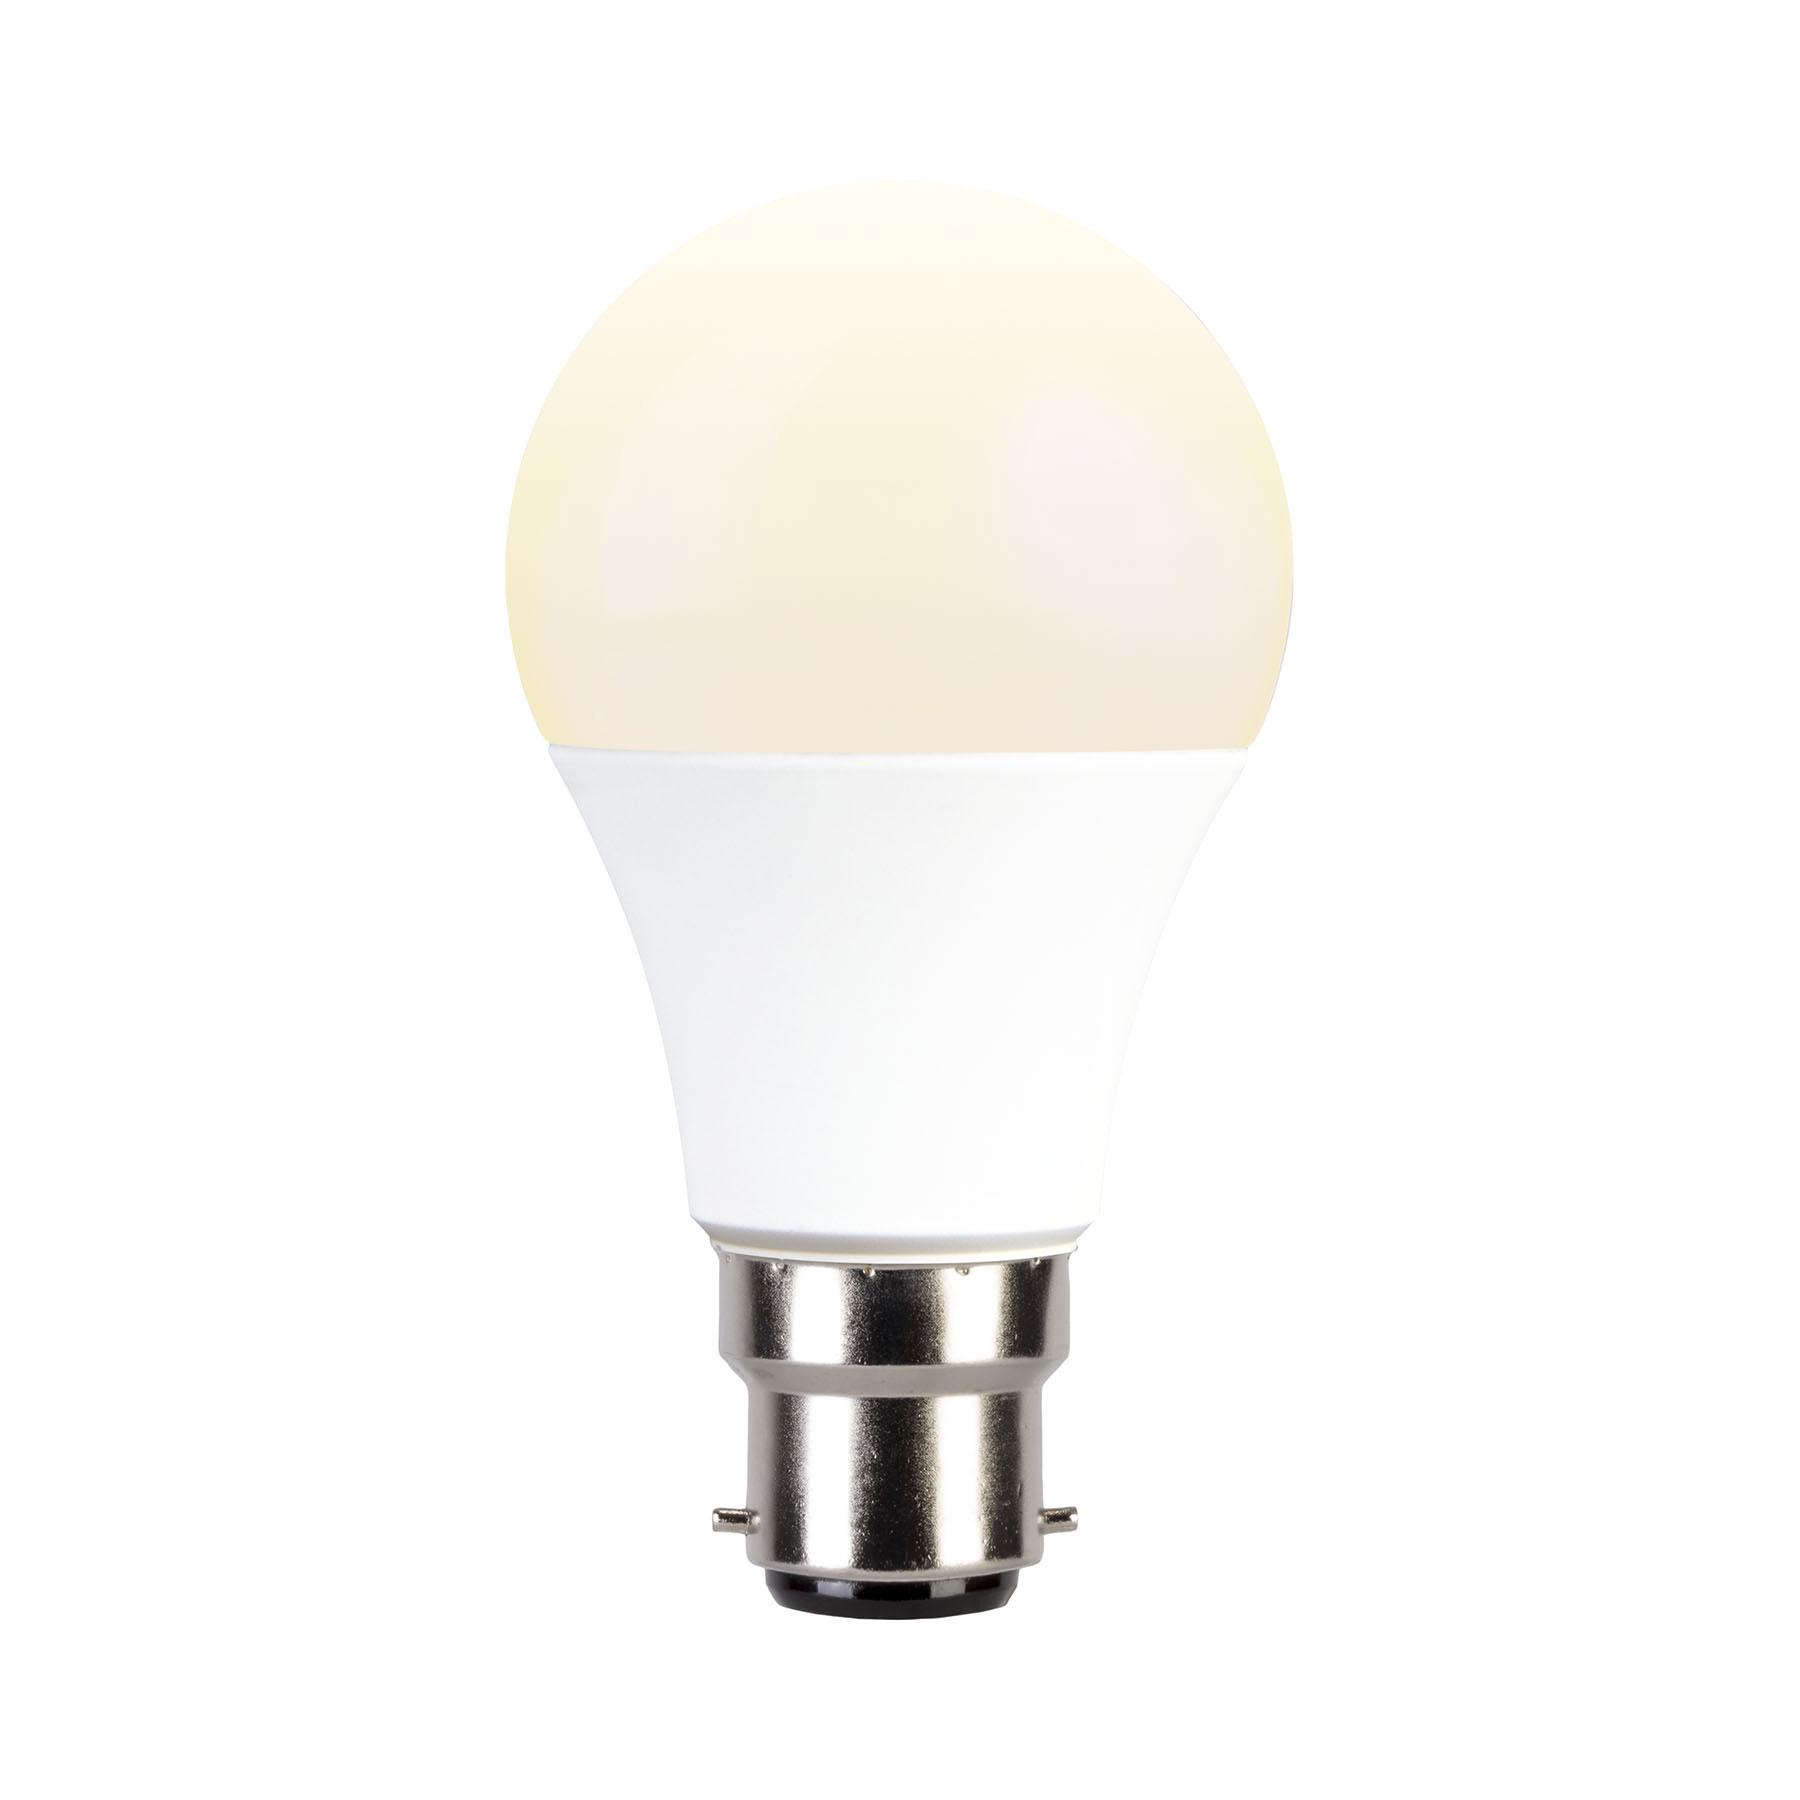 9watt Smart GLS LED BC B22 Bayonet Cap Colour Changing Wifi Bulb